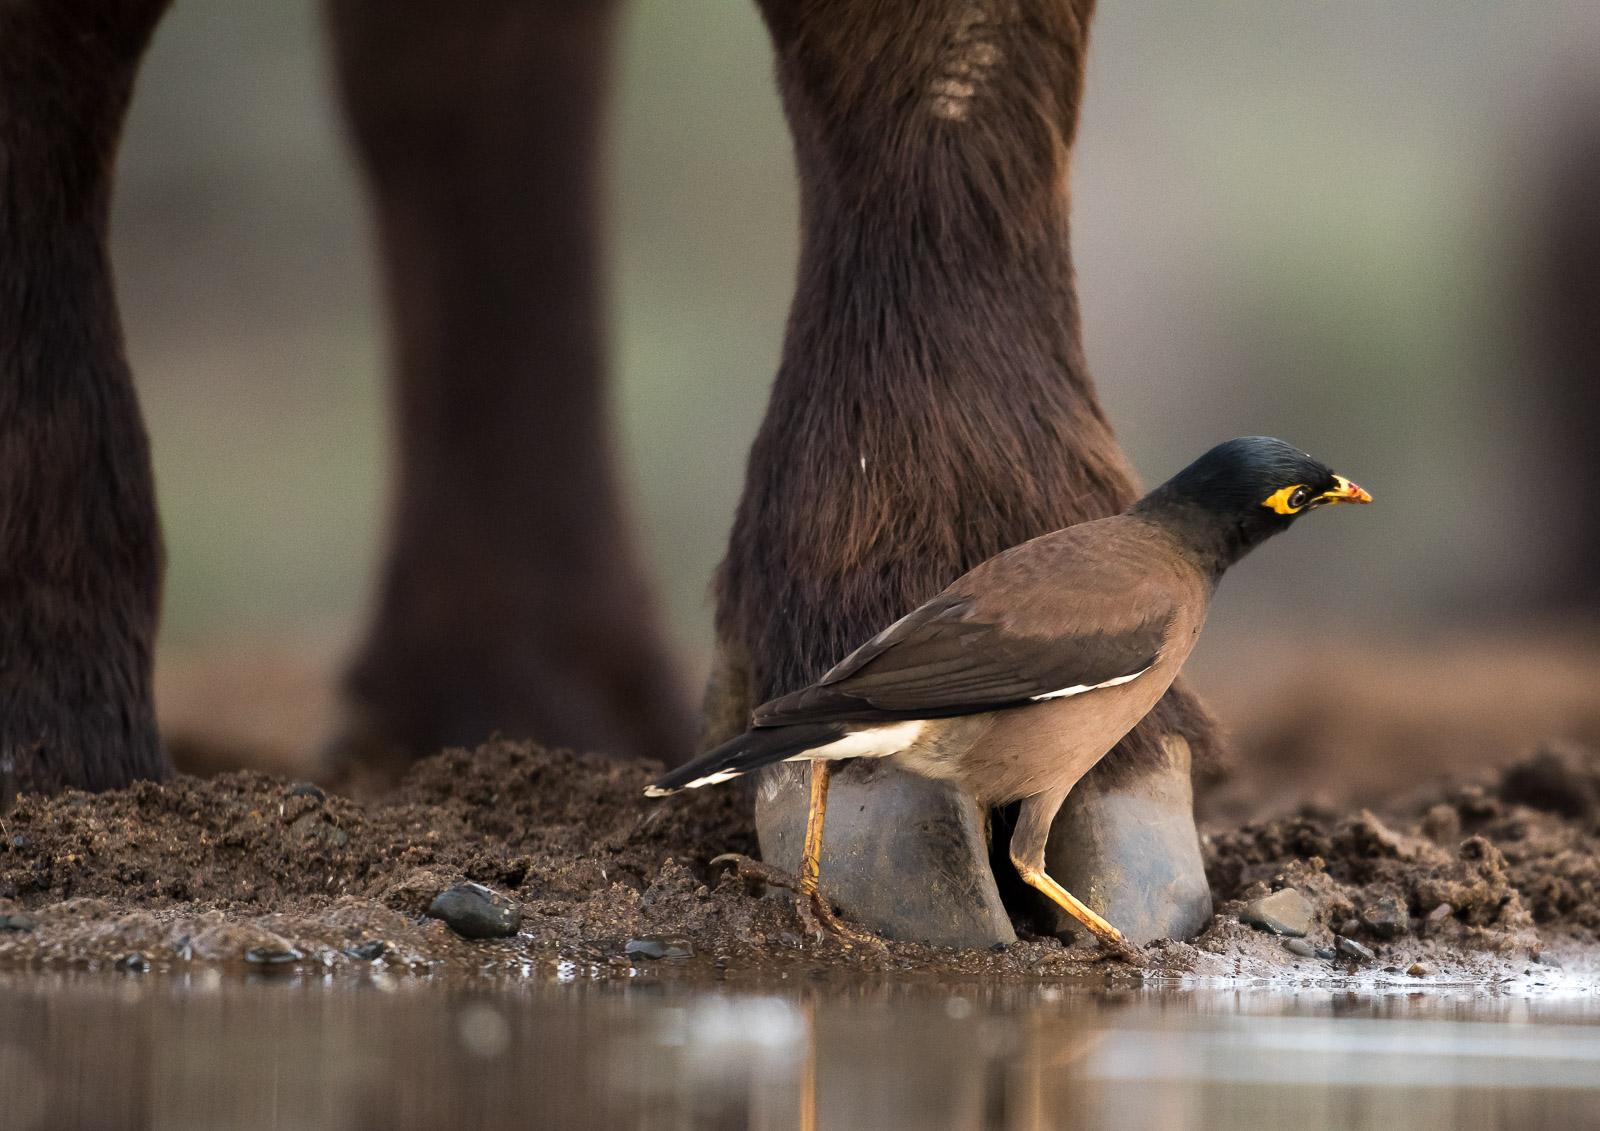 UMGODI: Indian minor treads lightly around a Cape Buffalo  Nikon D500 70-200mm f2.8 at 200mm. 1/640, f2.8, ISO640